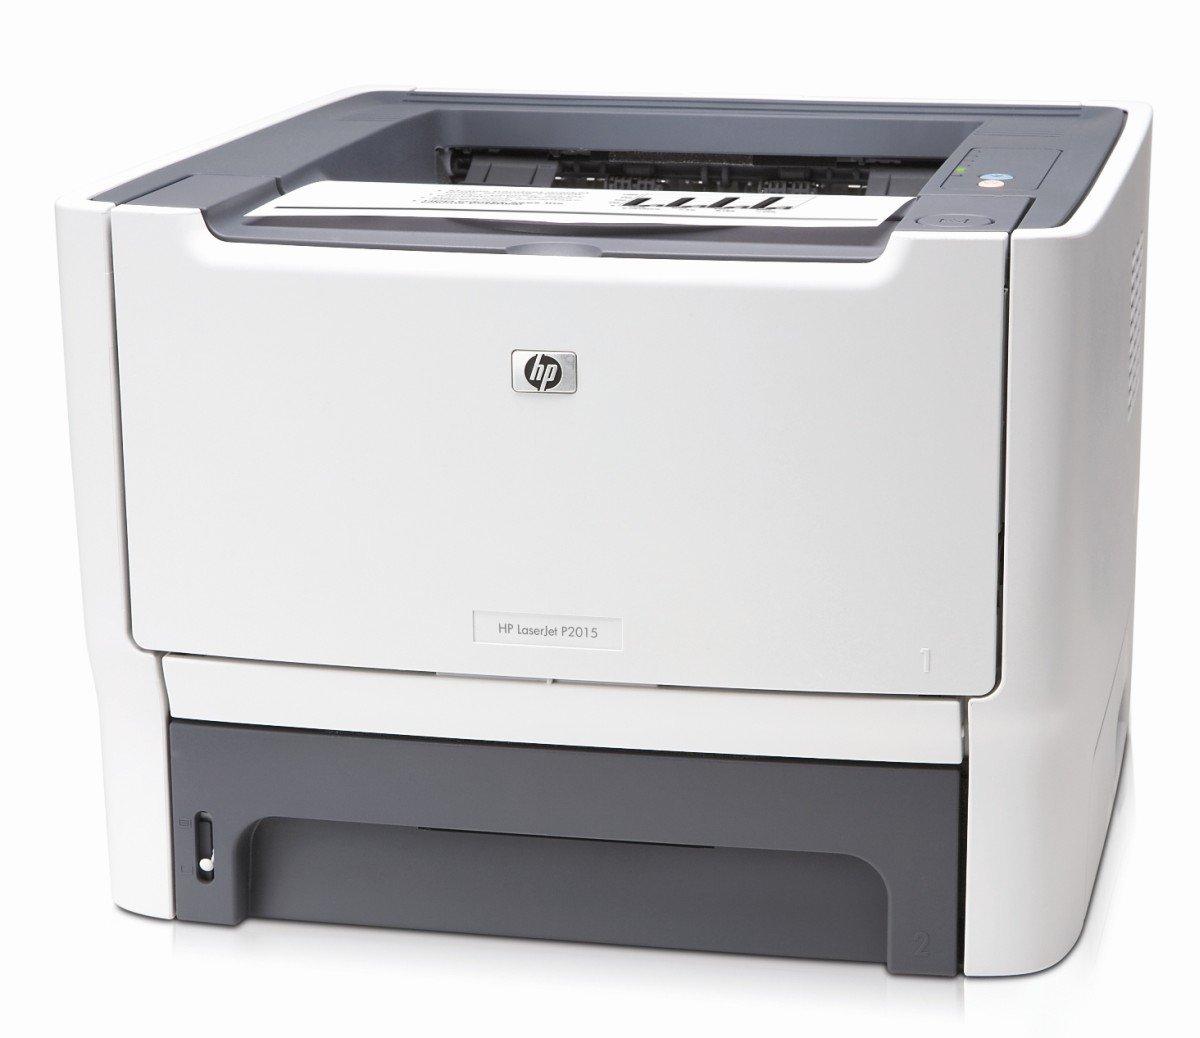 Amazon.com: HP LaserJet P2015 USB 2.0 Monochrome Laser Printer w/Toner:  Electronics